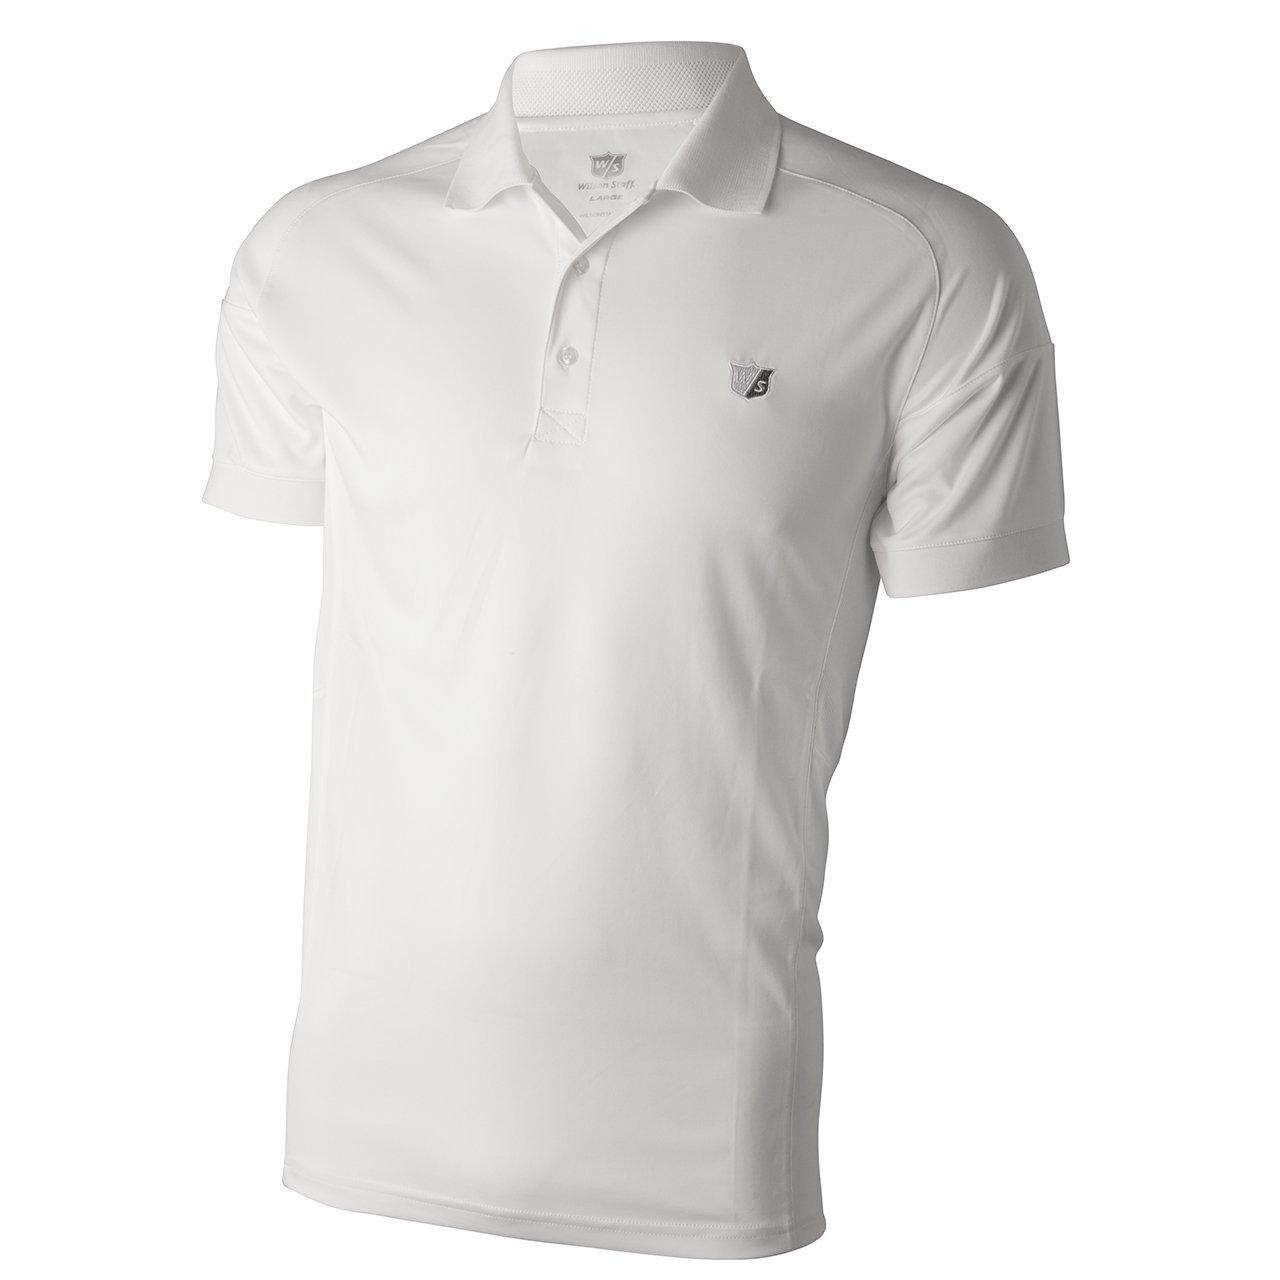 Wilson Staff Mens Performance Polo Camiseta de tamaño XL, Color ...